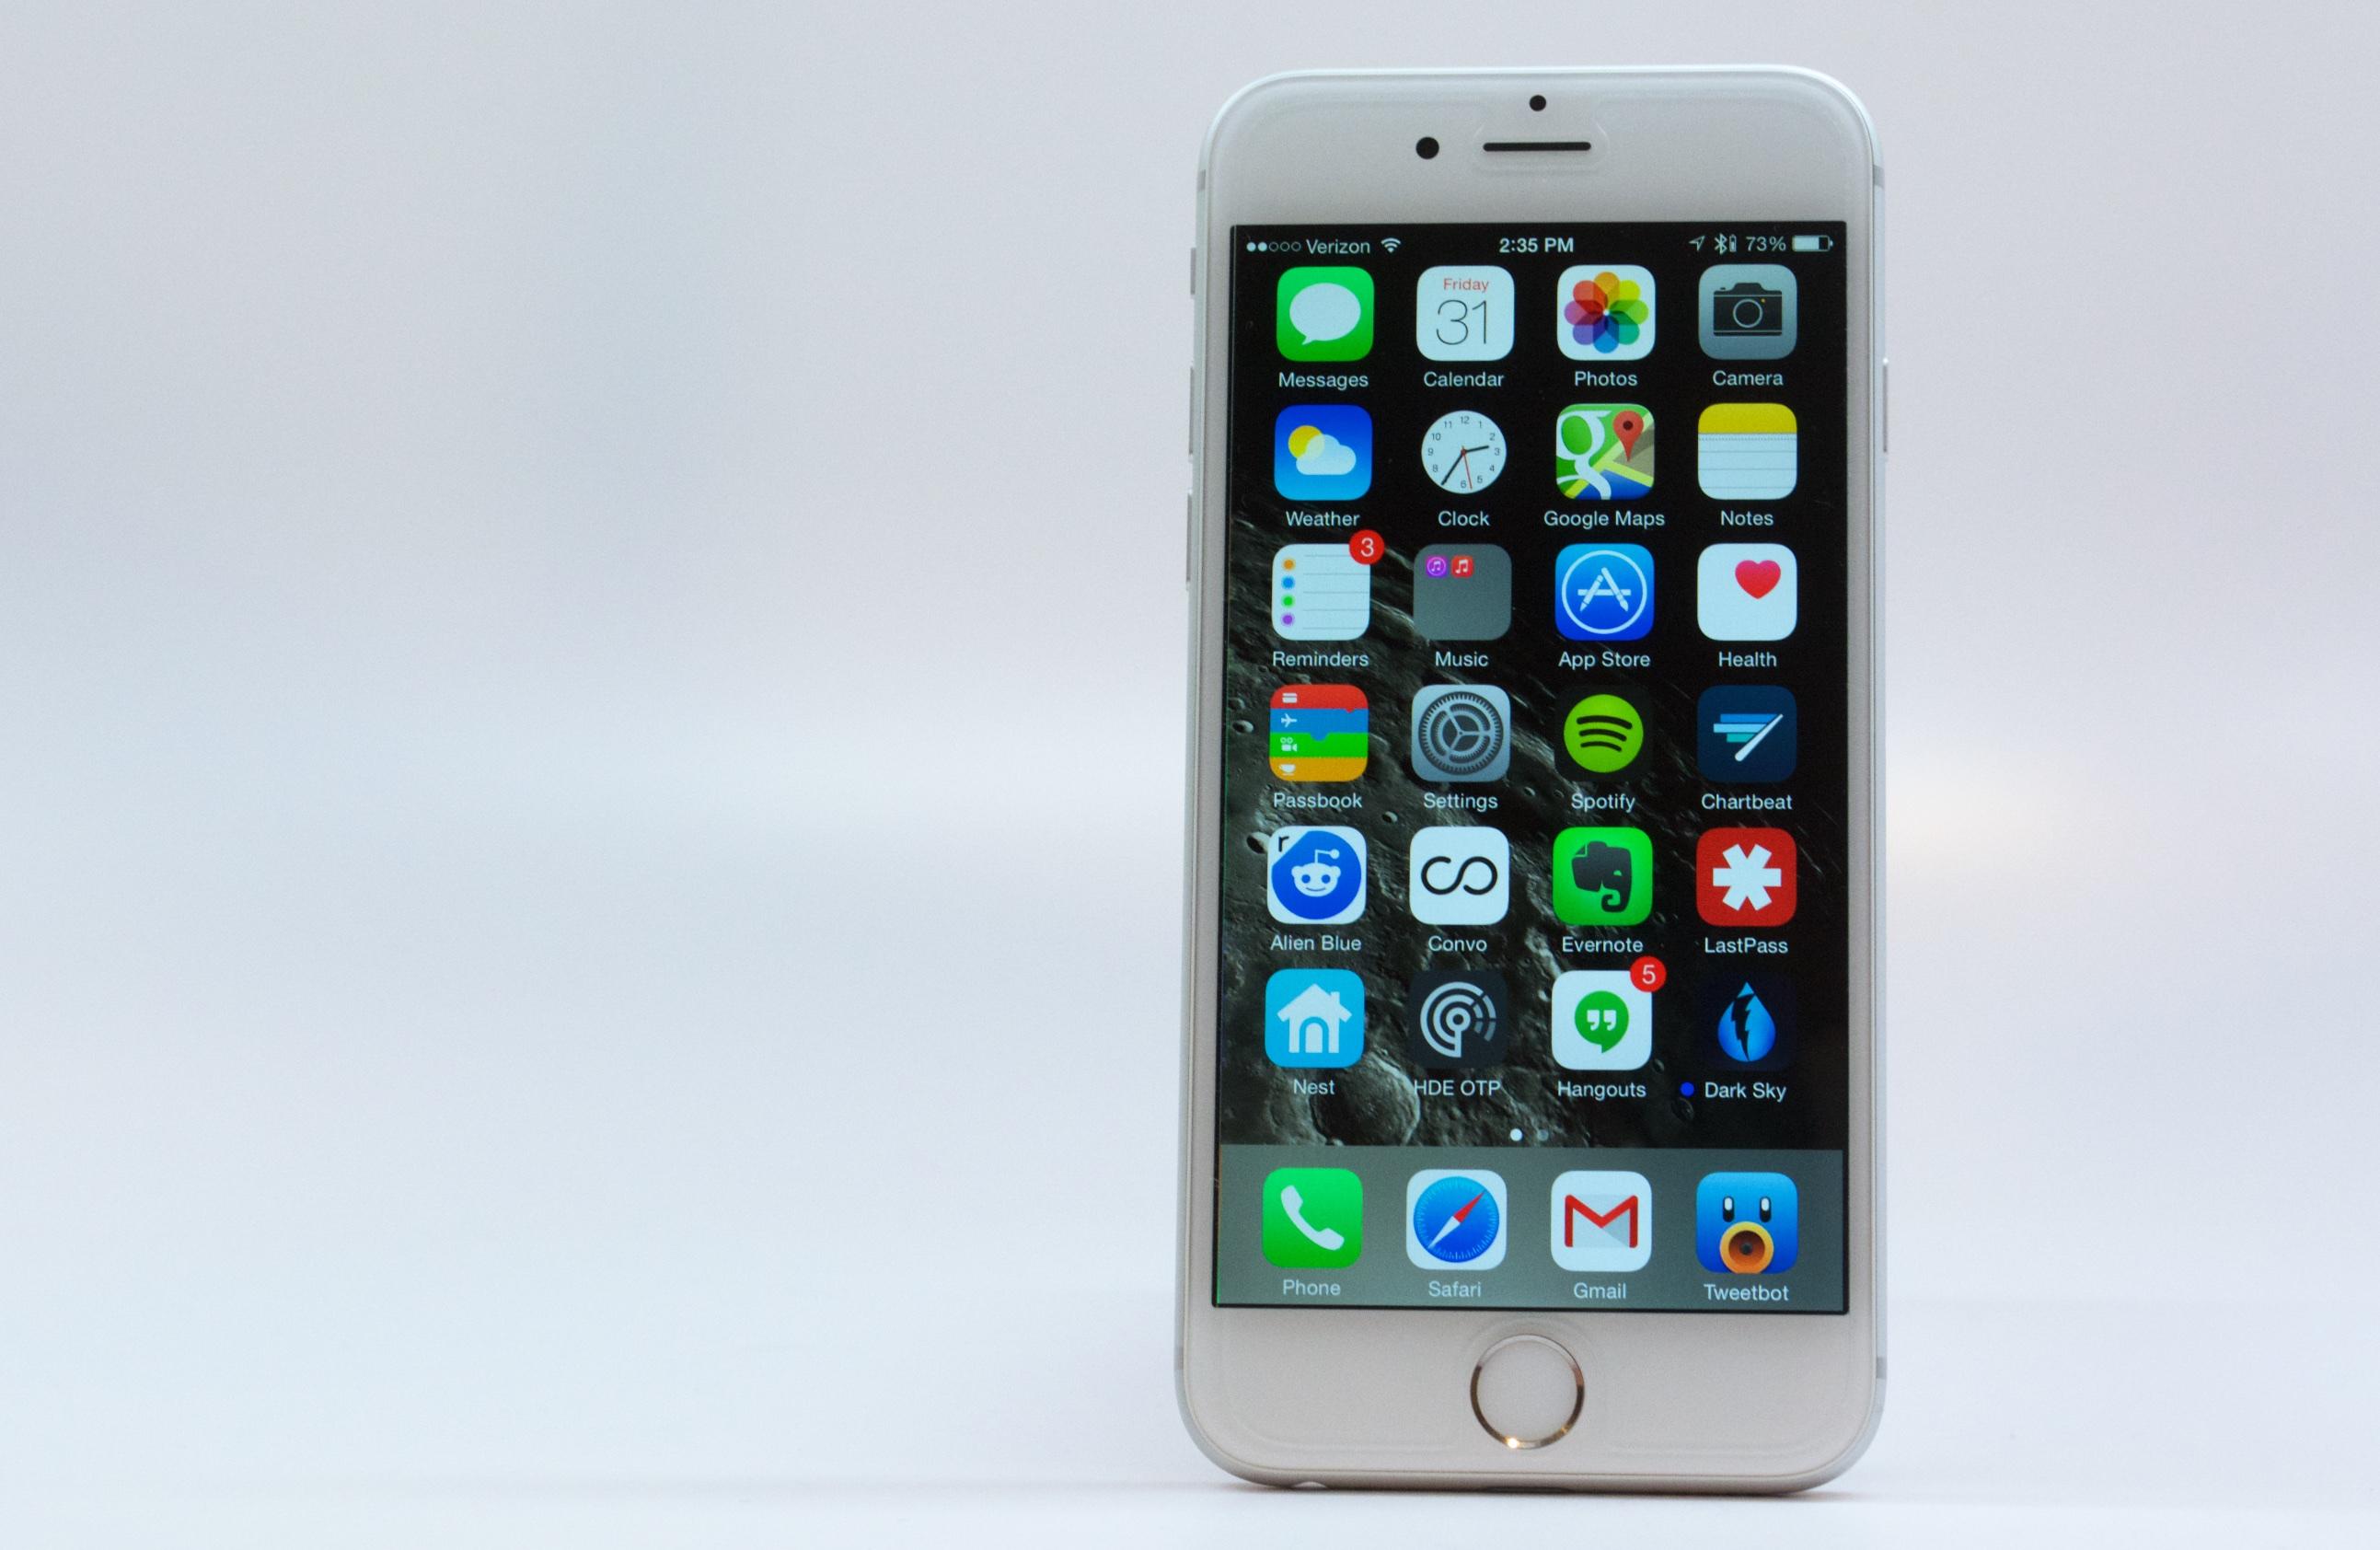 Iphone+4gs+release+date+2011